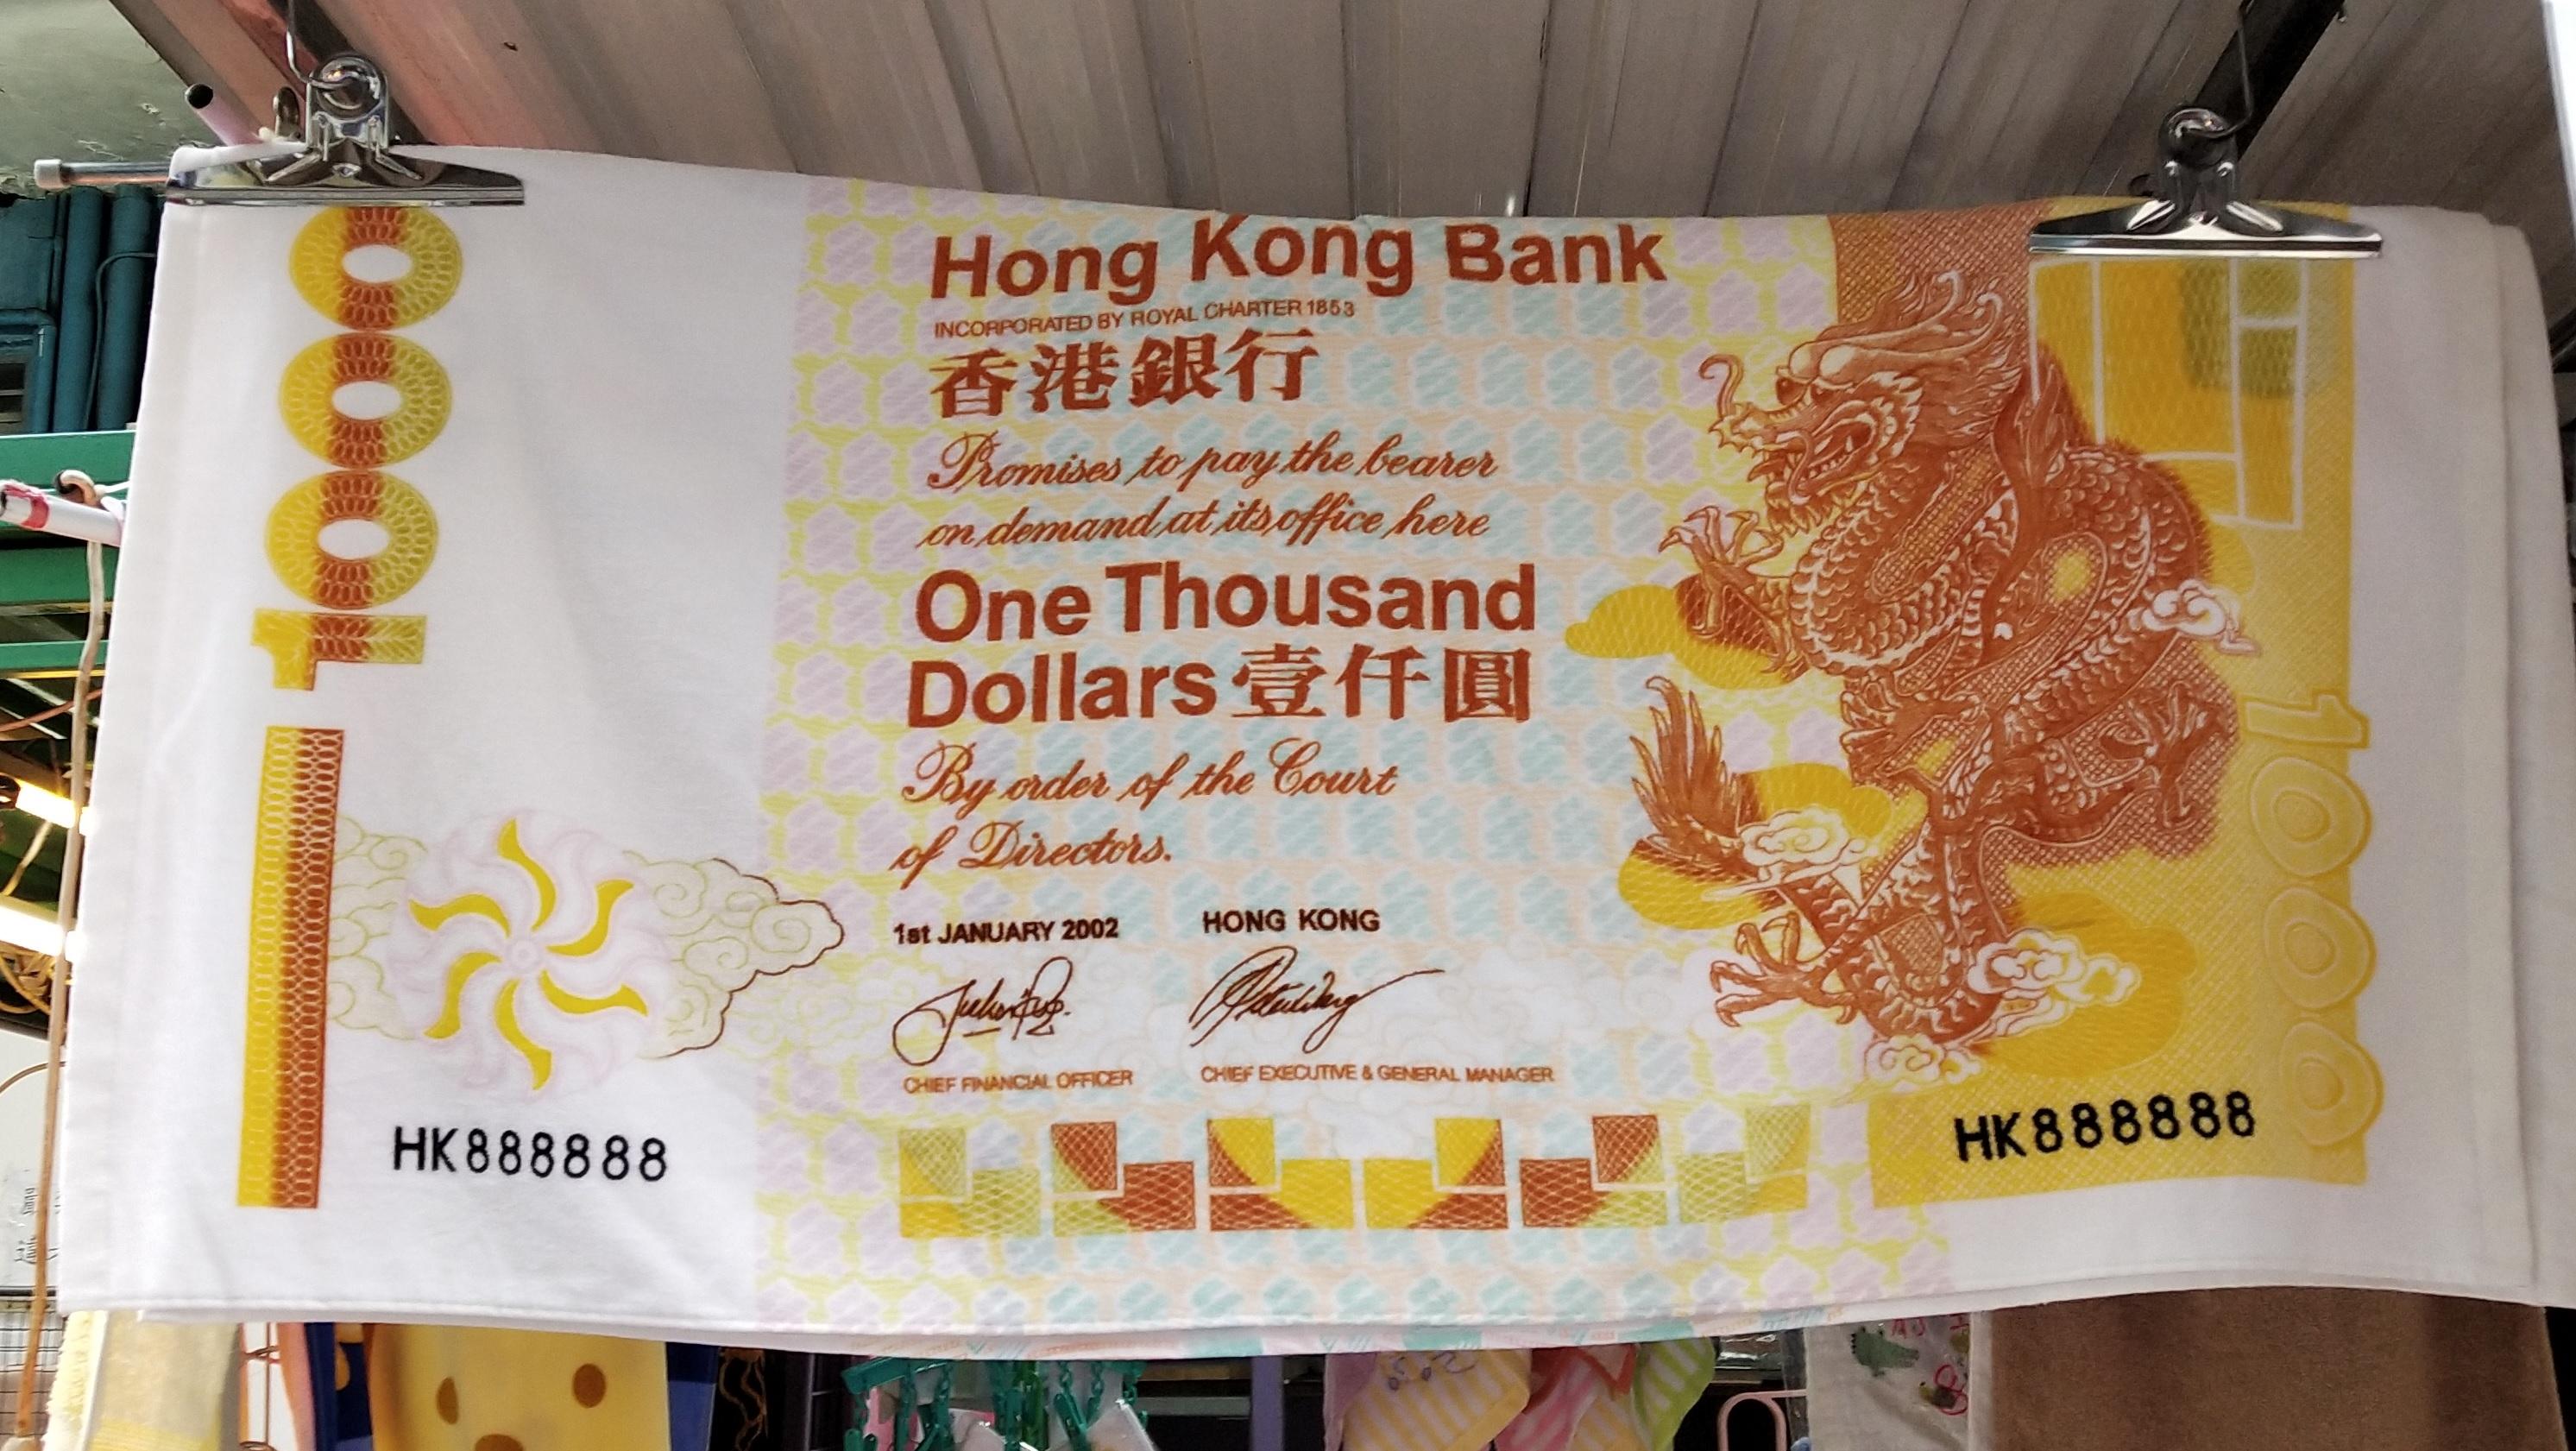 golden towel look like 1000 Hong Kong dollar note